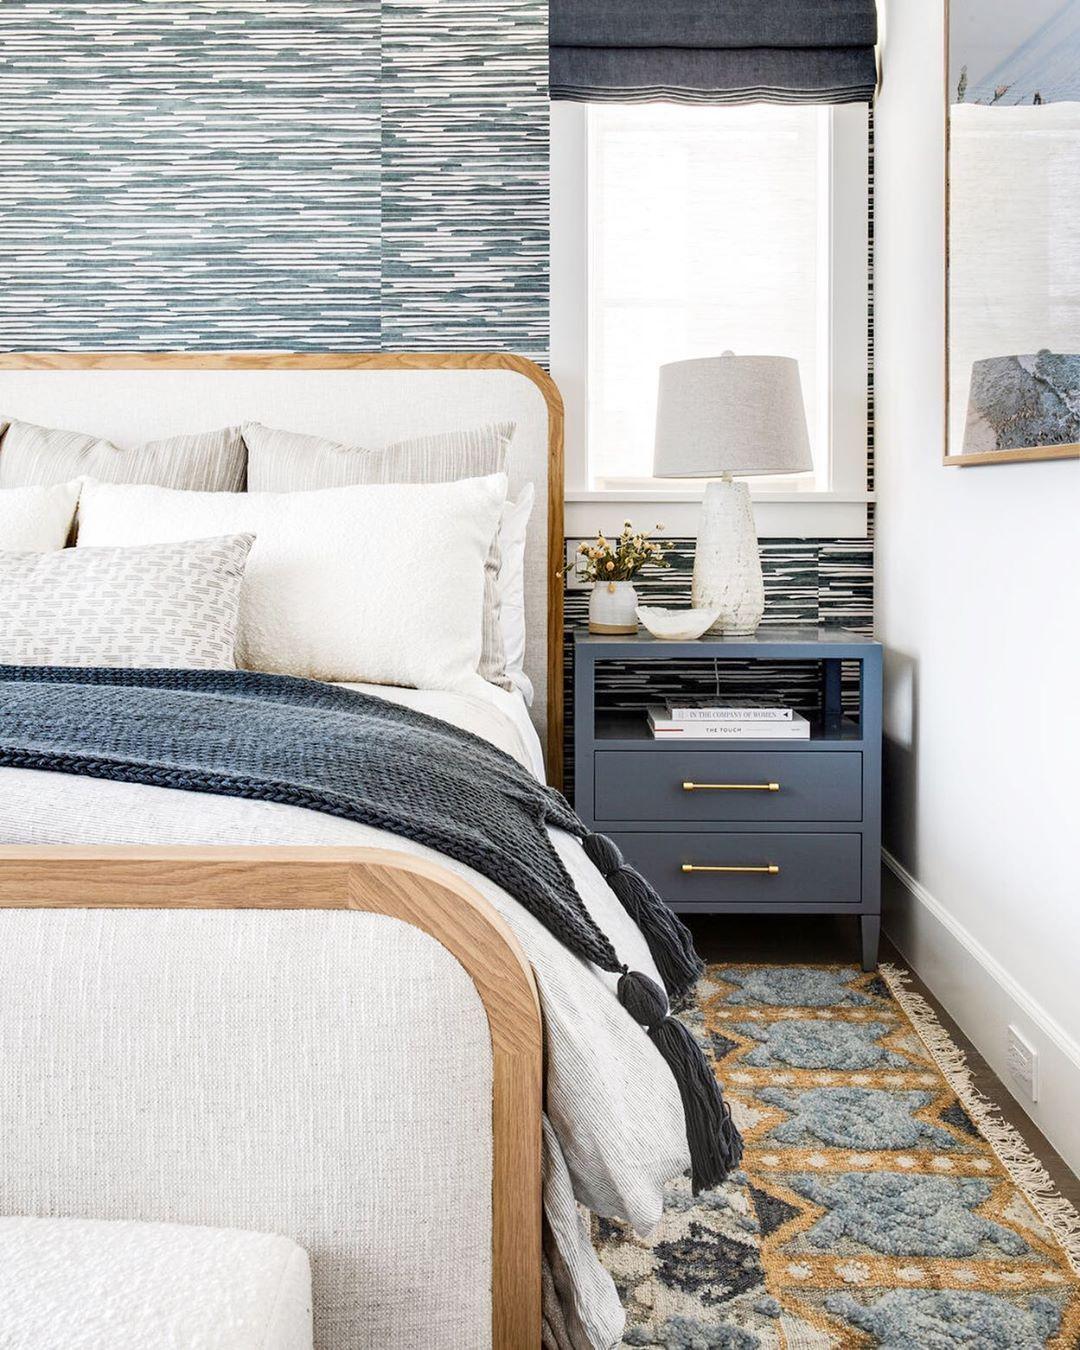 "Brooke Wagner Design on Instagram: ""Nubby blues & neutral hues...perfect recipe for a good nights sleep ♡  #sweetdreams #neutraldecor #masterbedroom #bluetones #interiordesign…"""